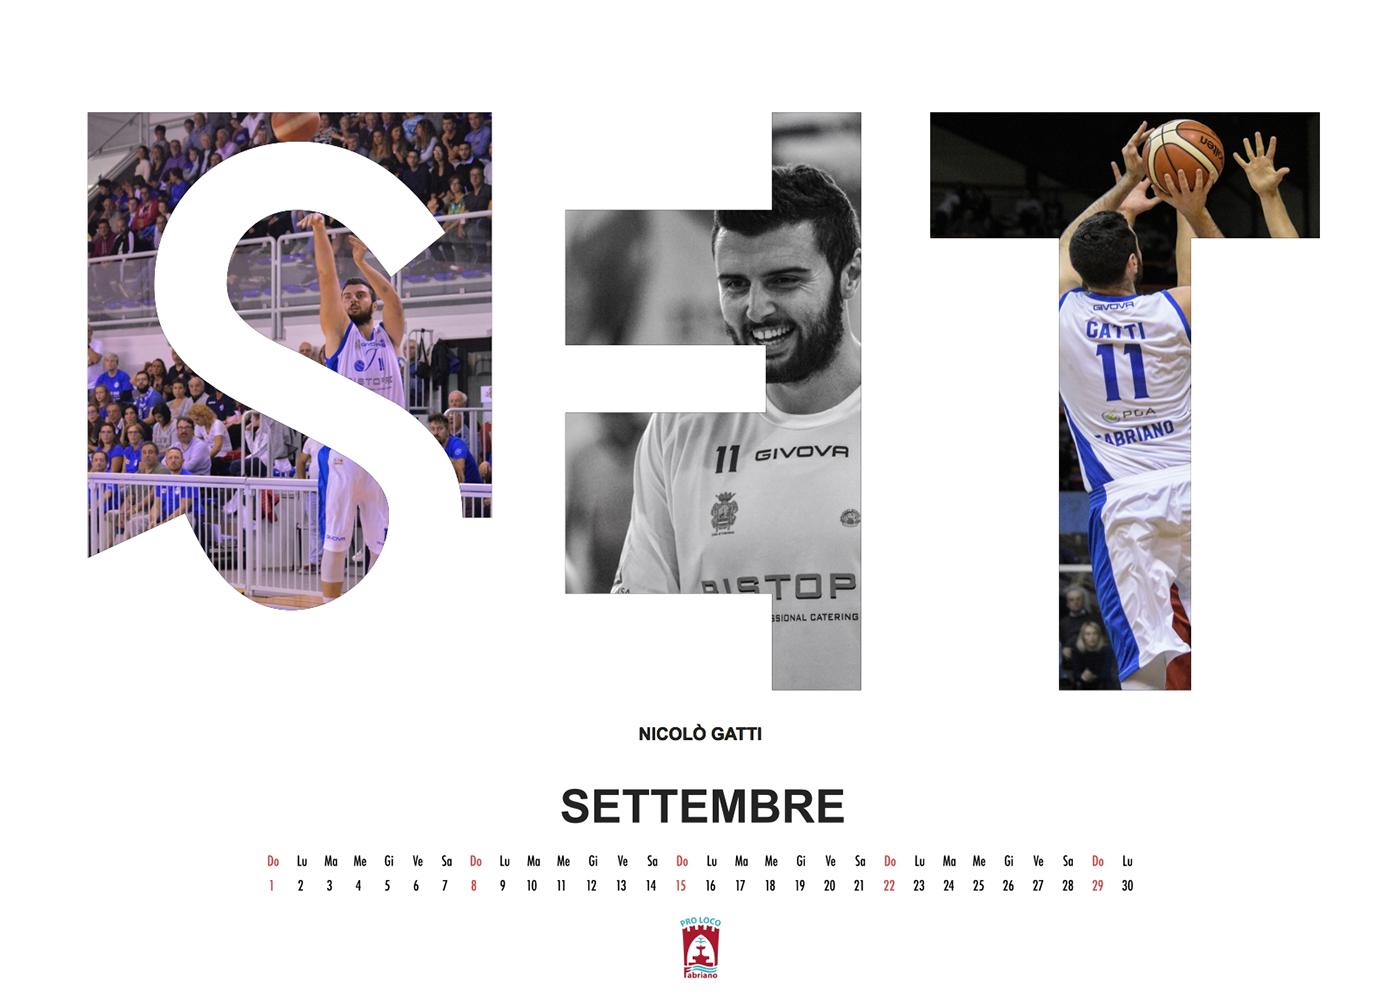 Victor Torresan Fabriano basket janus fabriano immaturi calendario prolocofabriano